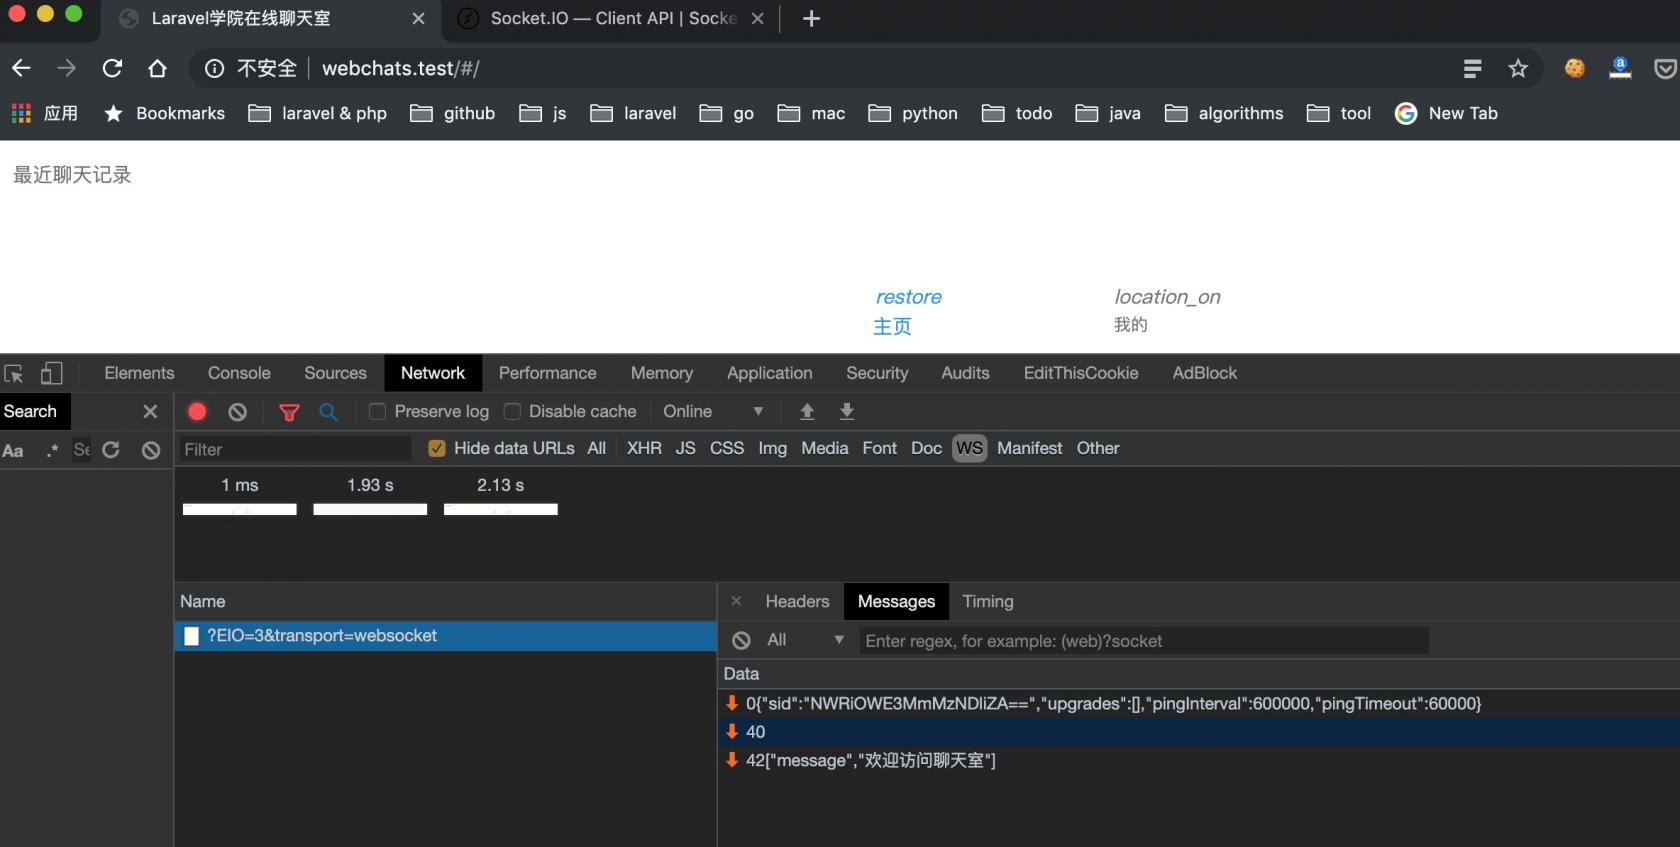 socket.io-client 与 swoole websocket 服务器连接建立